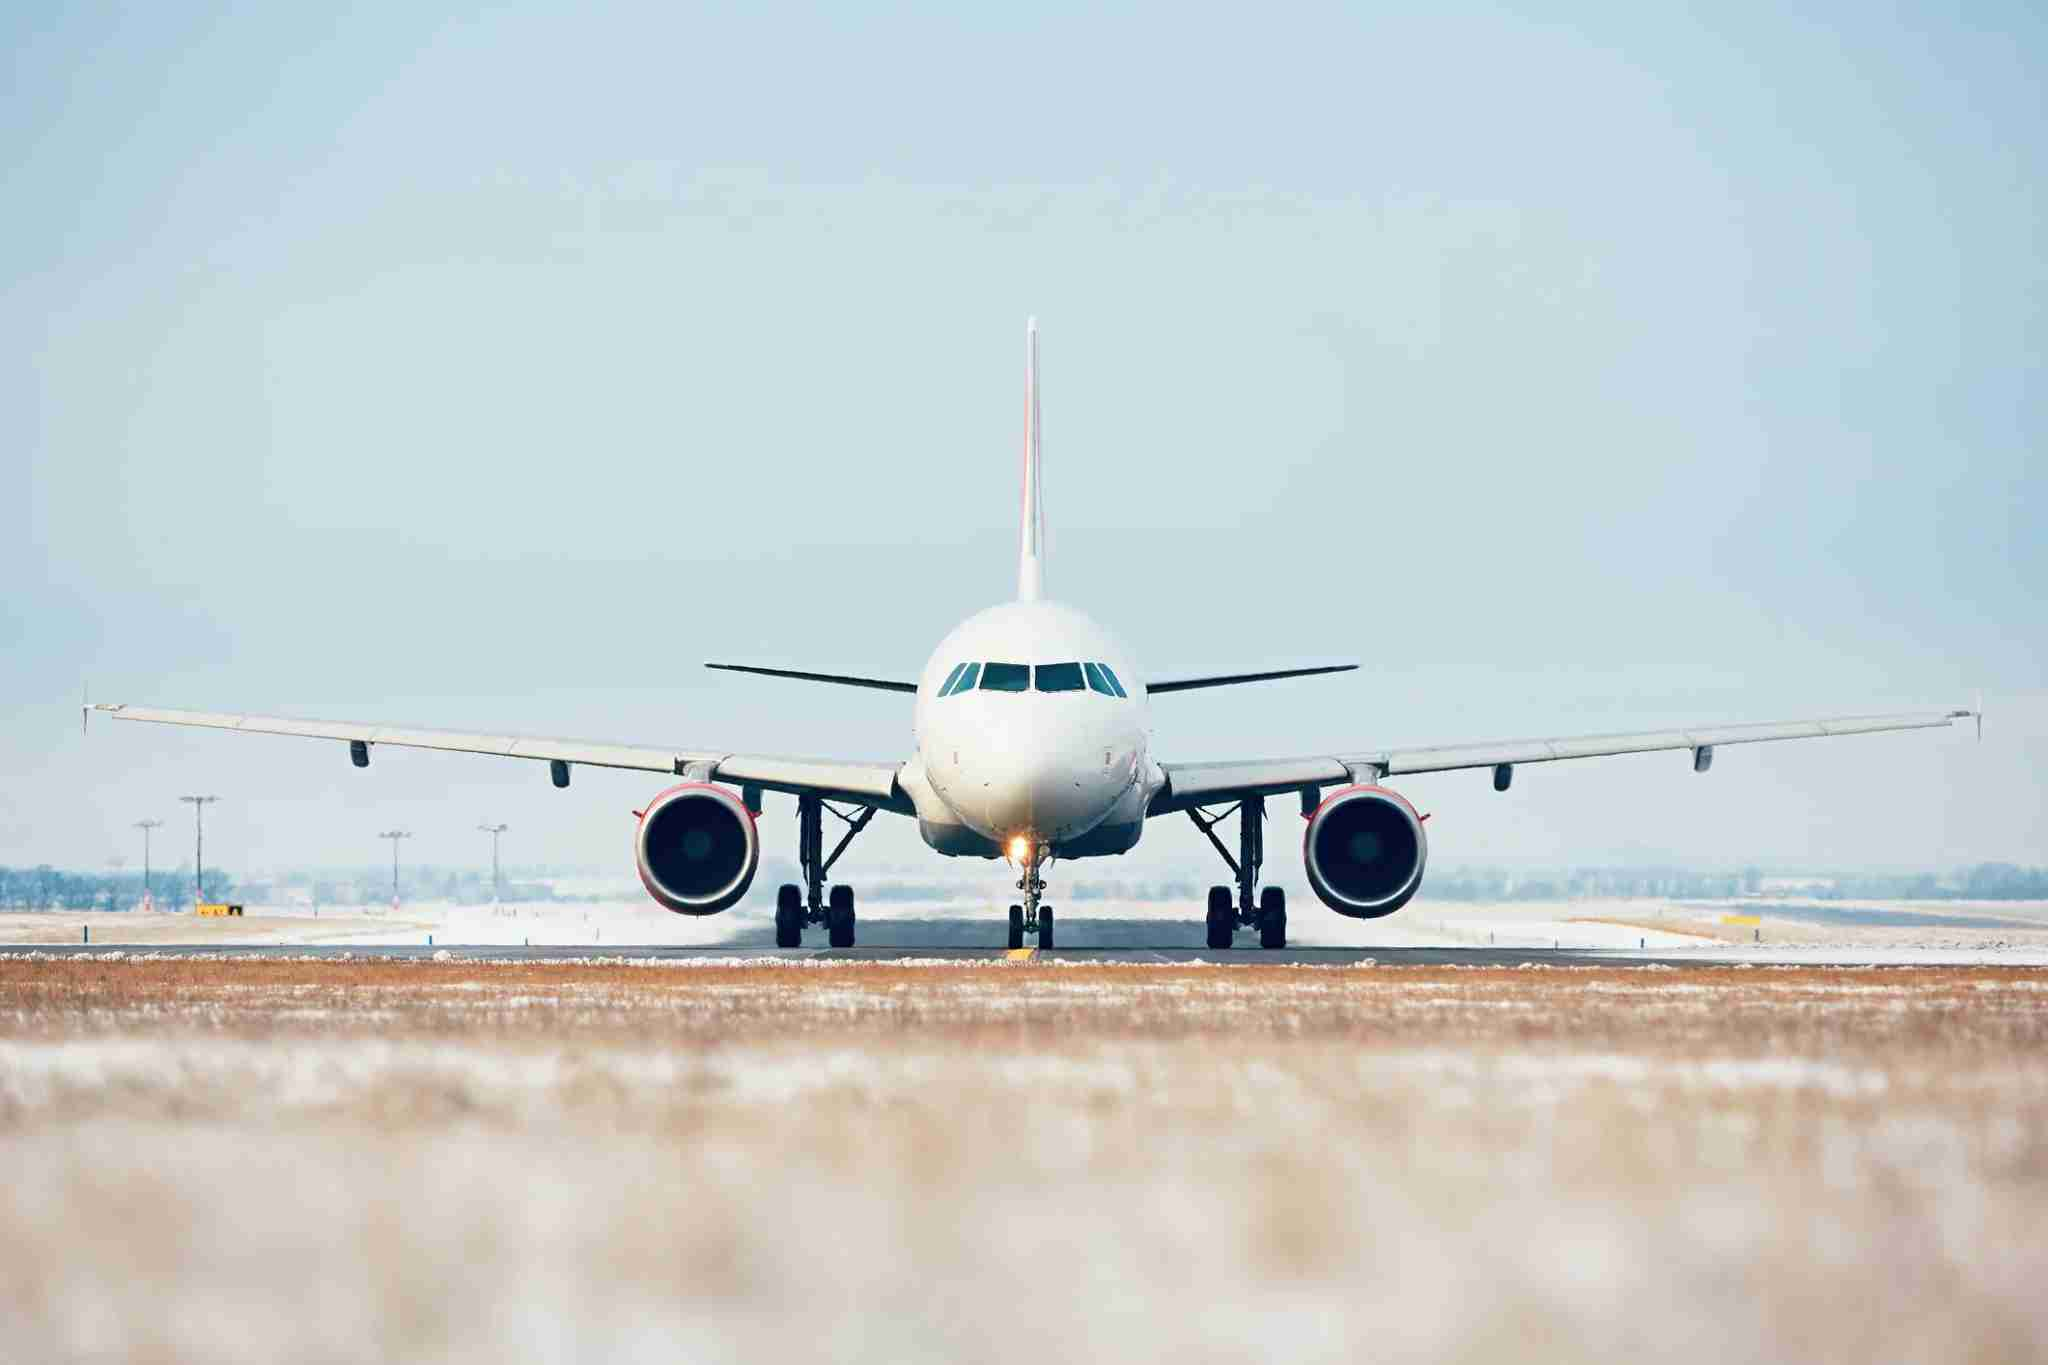 An airplane on an airport runway. (Credit: Jaromir Chalabala/EyeEm via Getty Images)